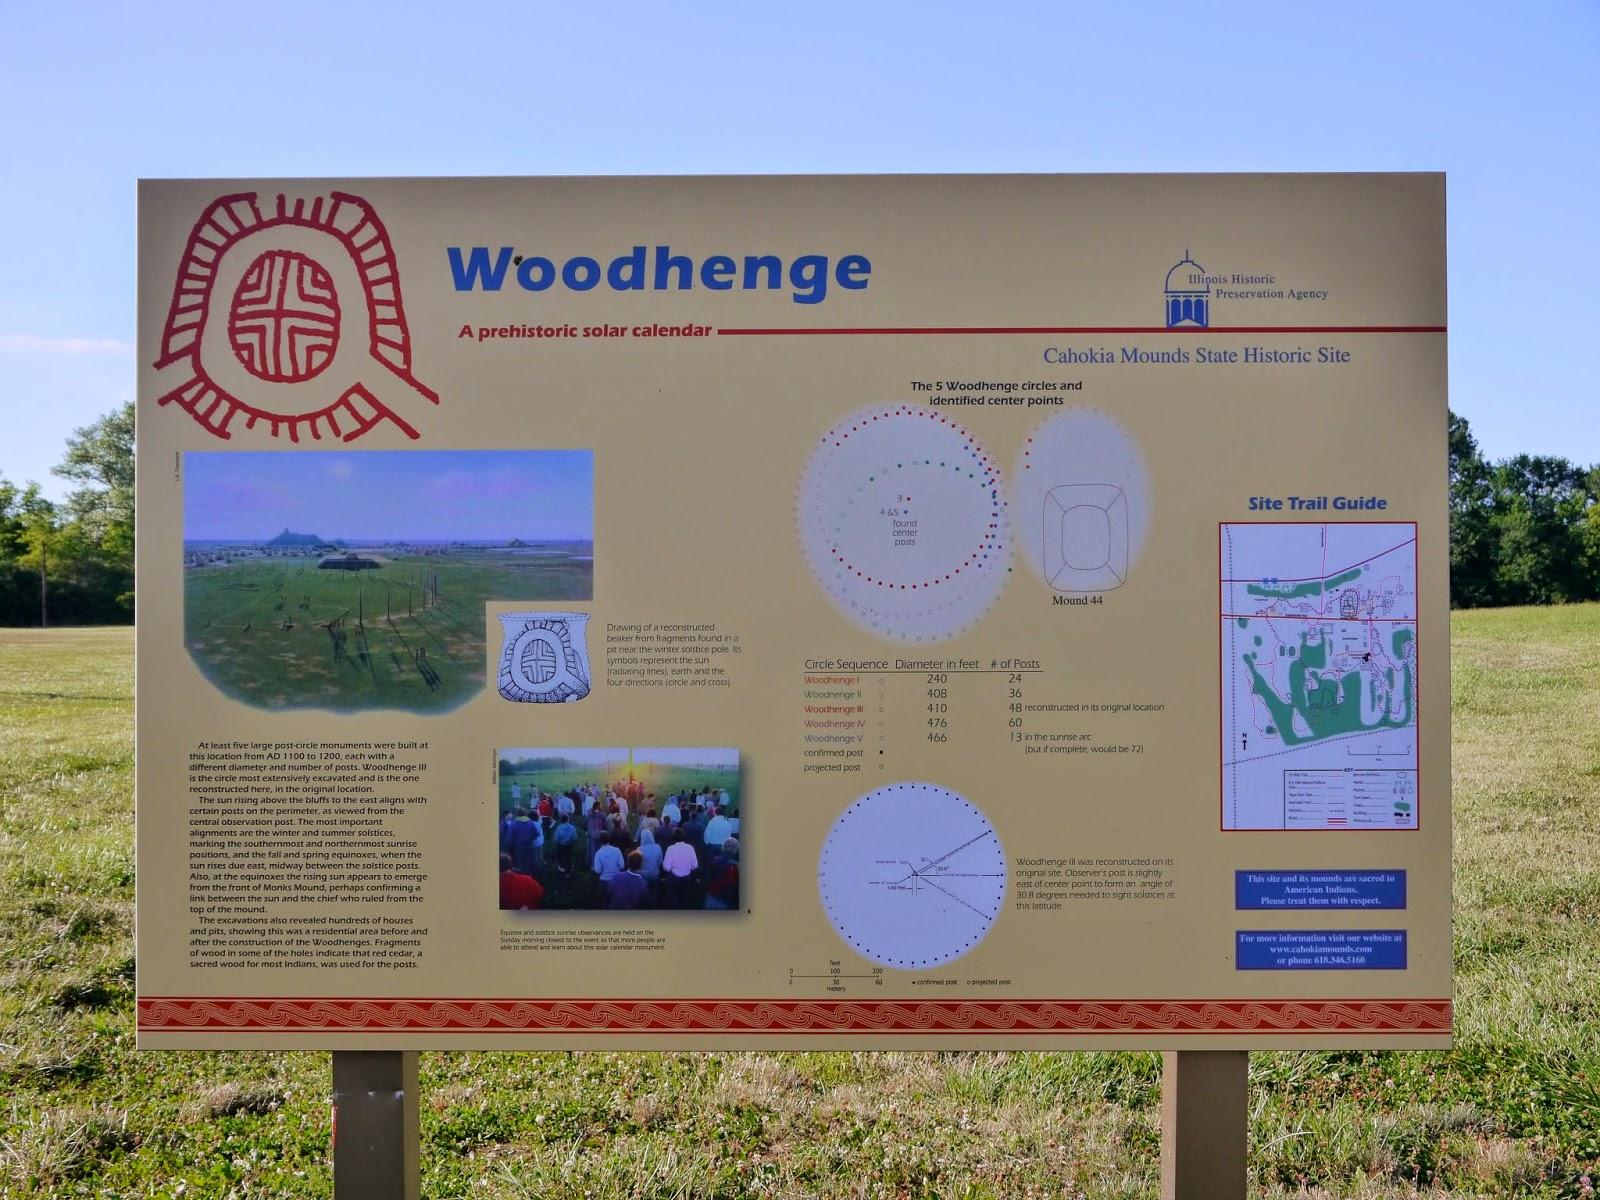 American Travel Journal: Woodhenge - Cahokia Mounds State